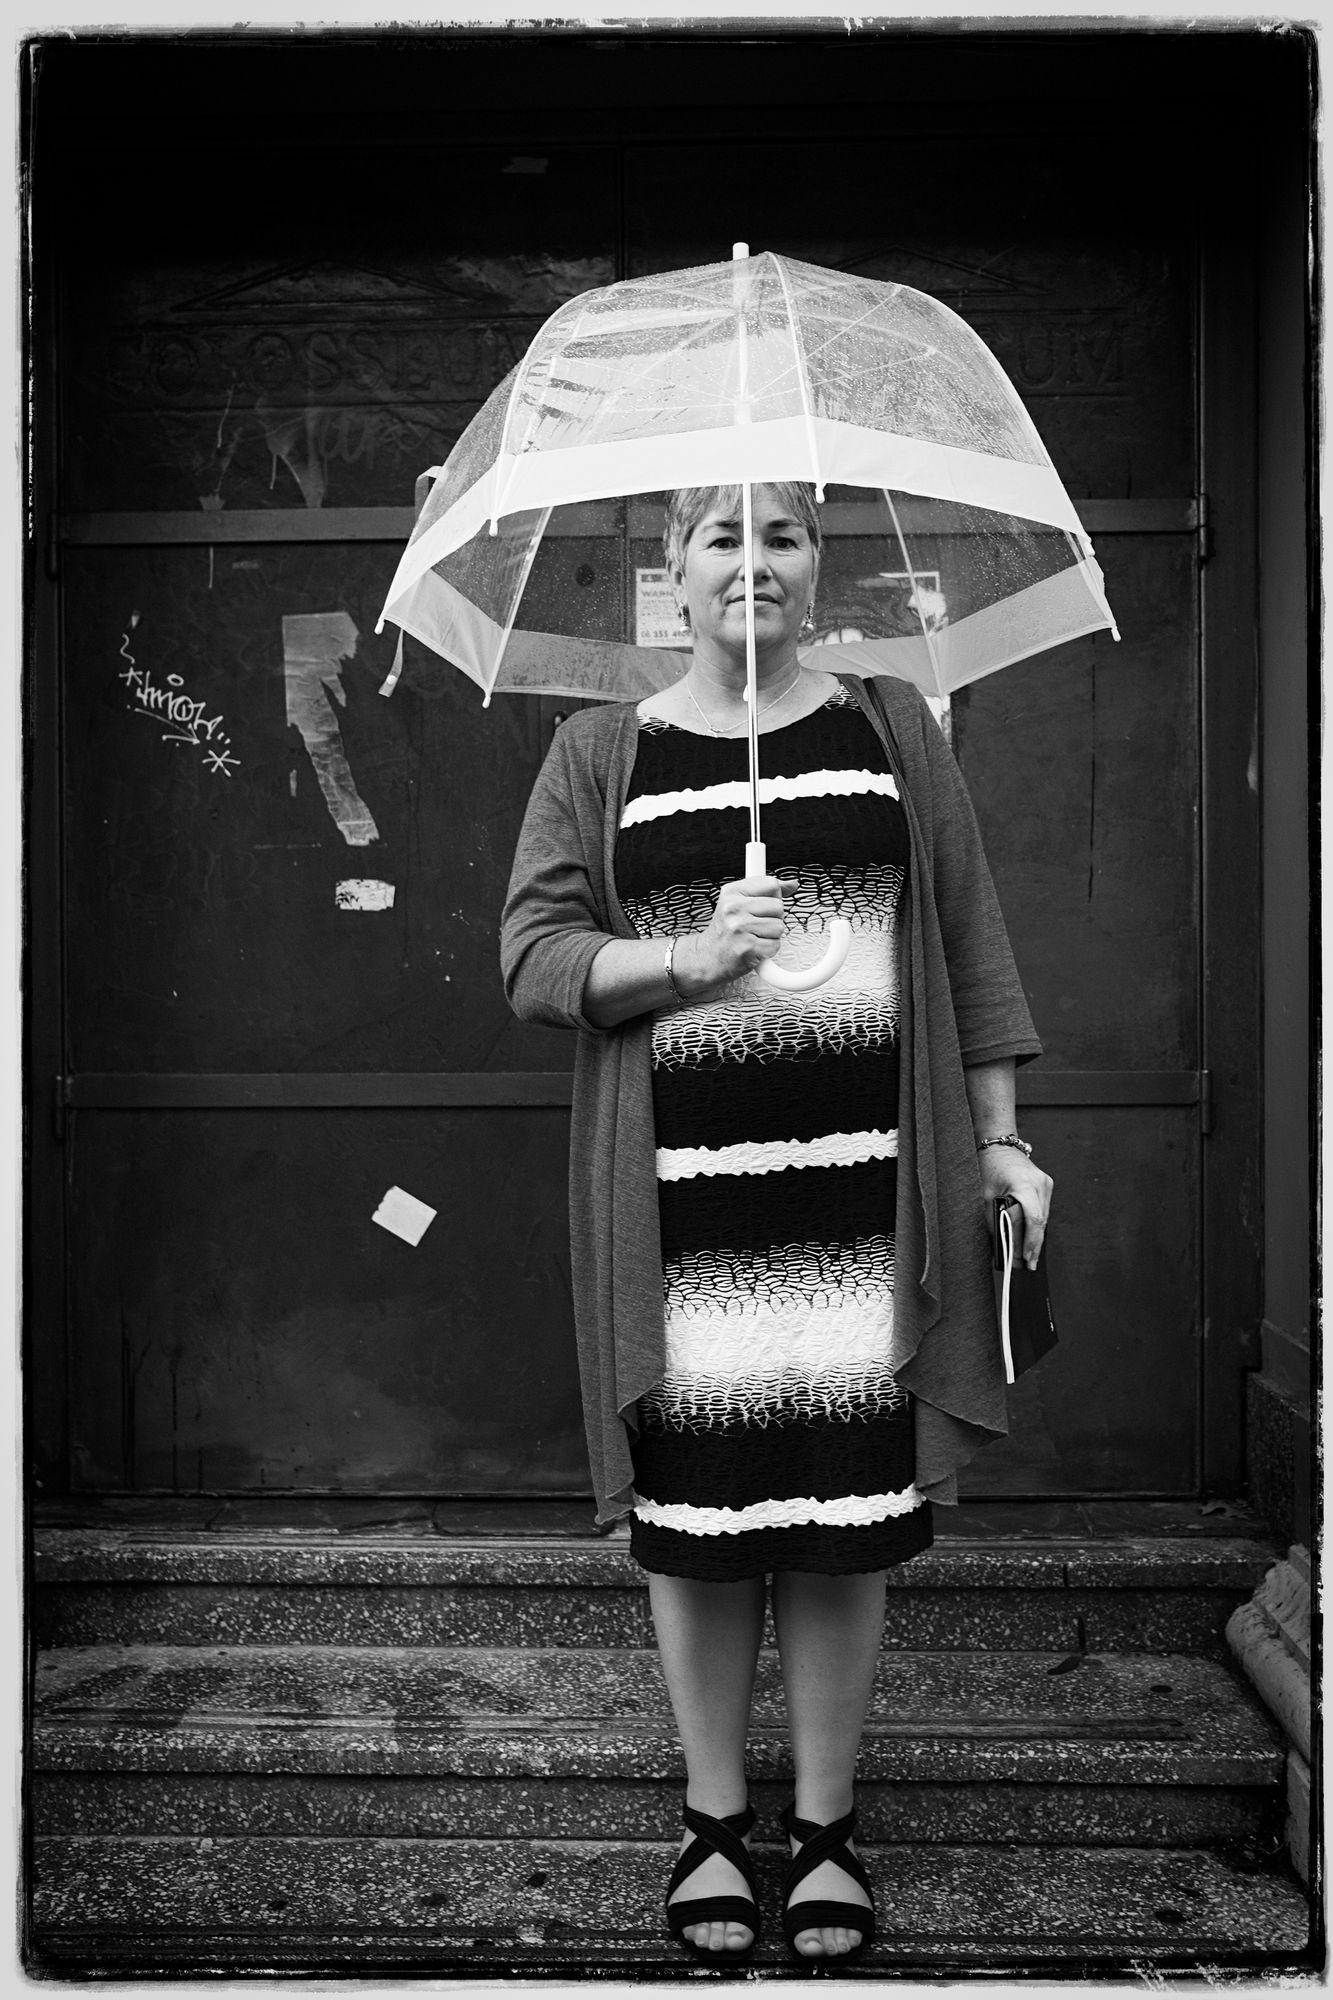 Tony Reddrop, from  Random Street Portraits